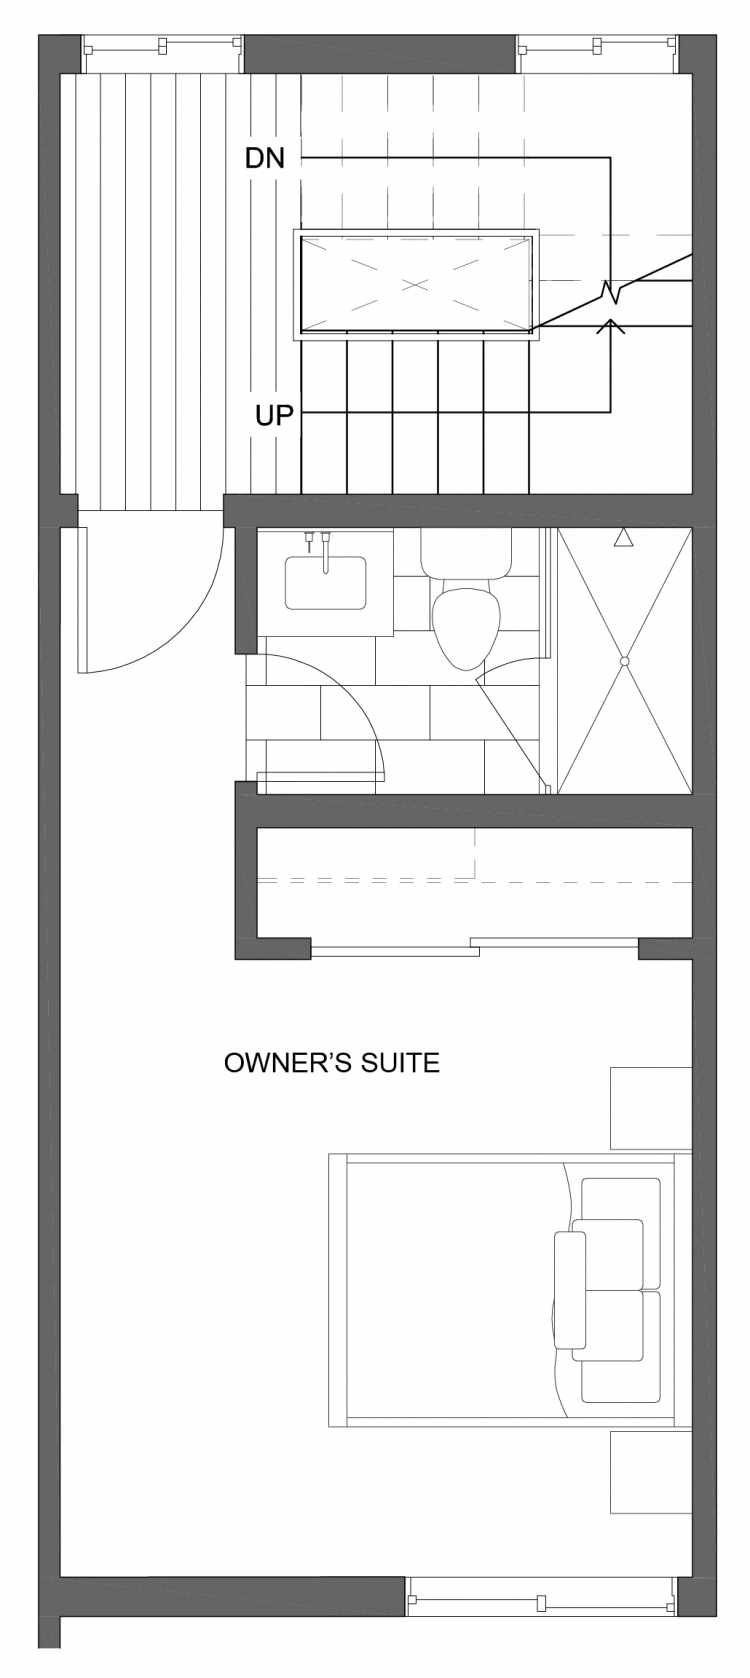 Third Floor Plan of 10429G Alderbrook Pl NW, One of the Jasmine Townhomes in the Greenwood Neighborhood of Seattle